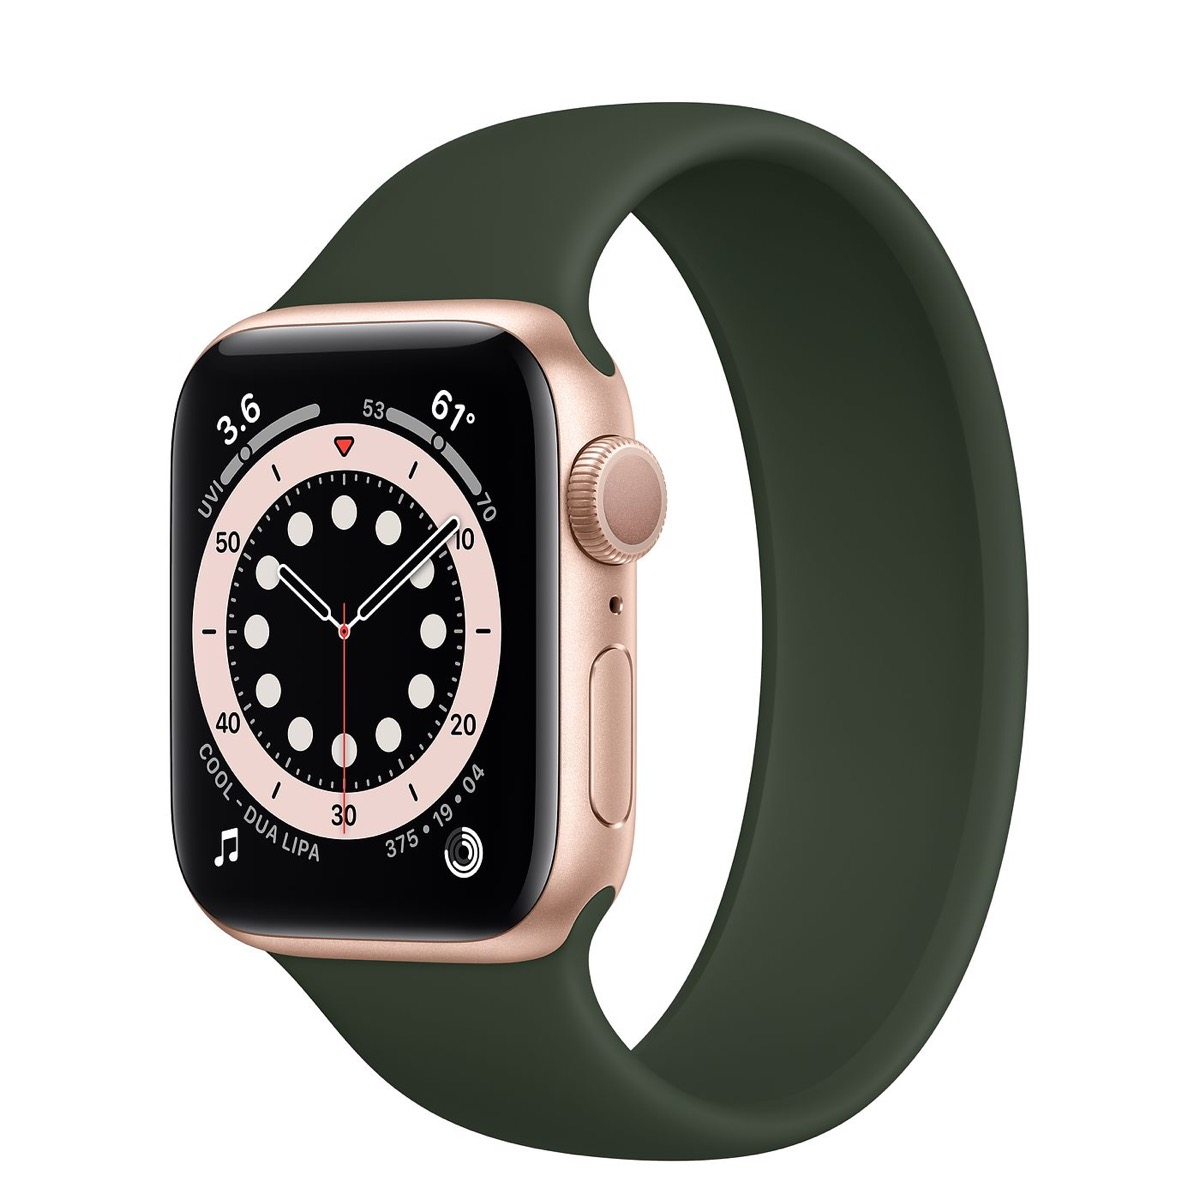 apple watch series 6 avec bande verte